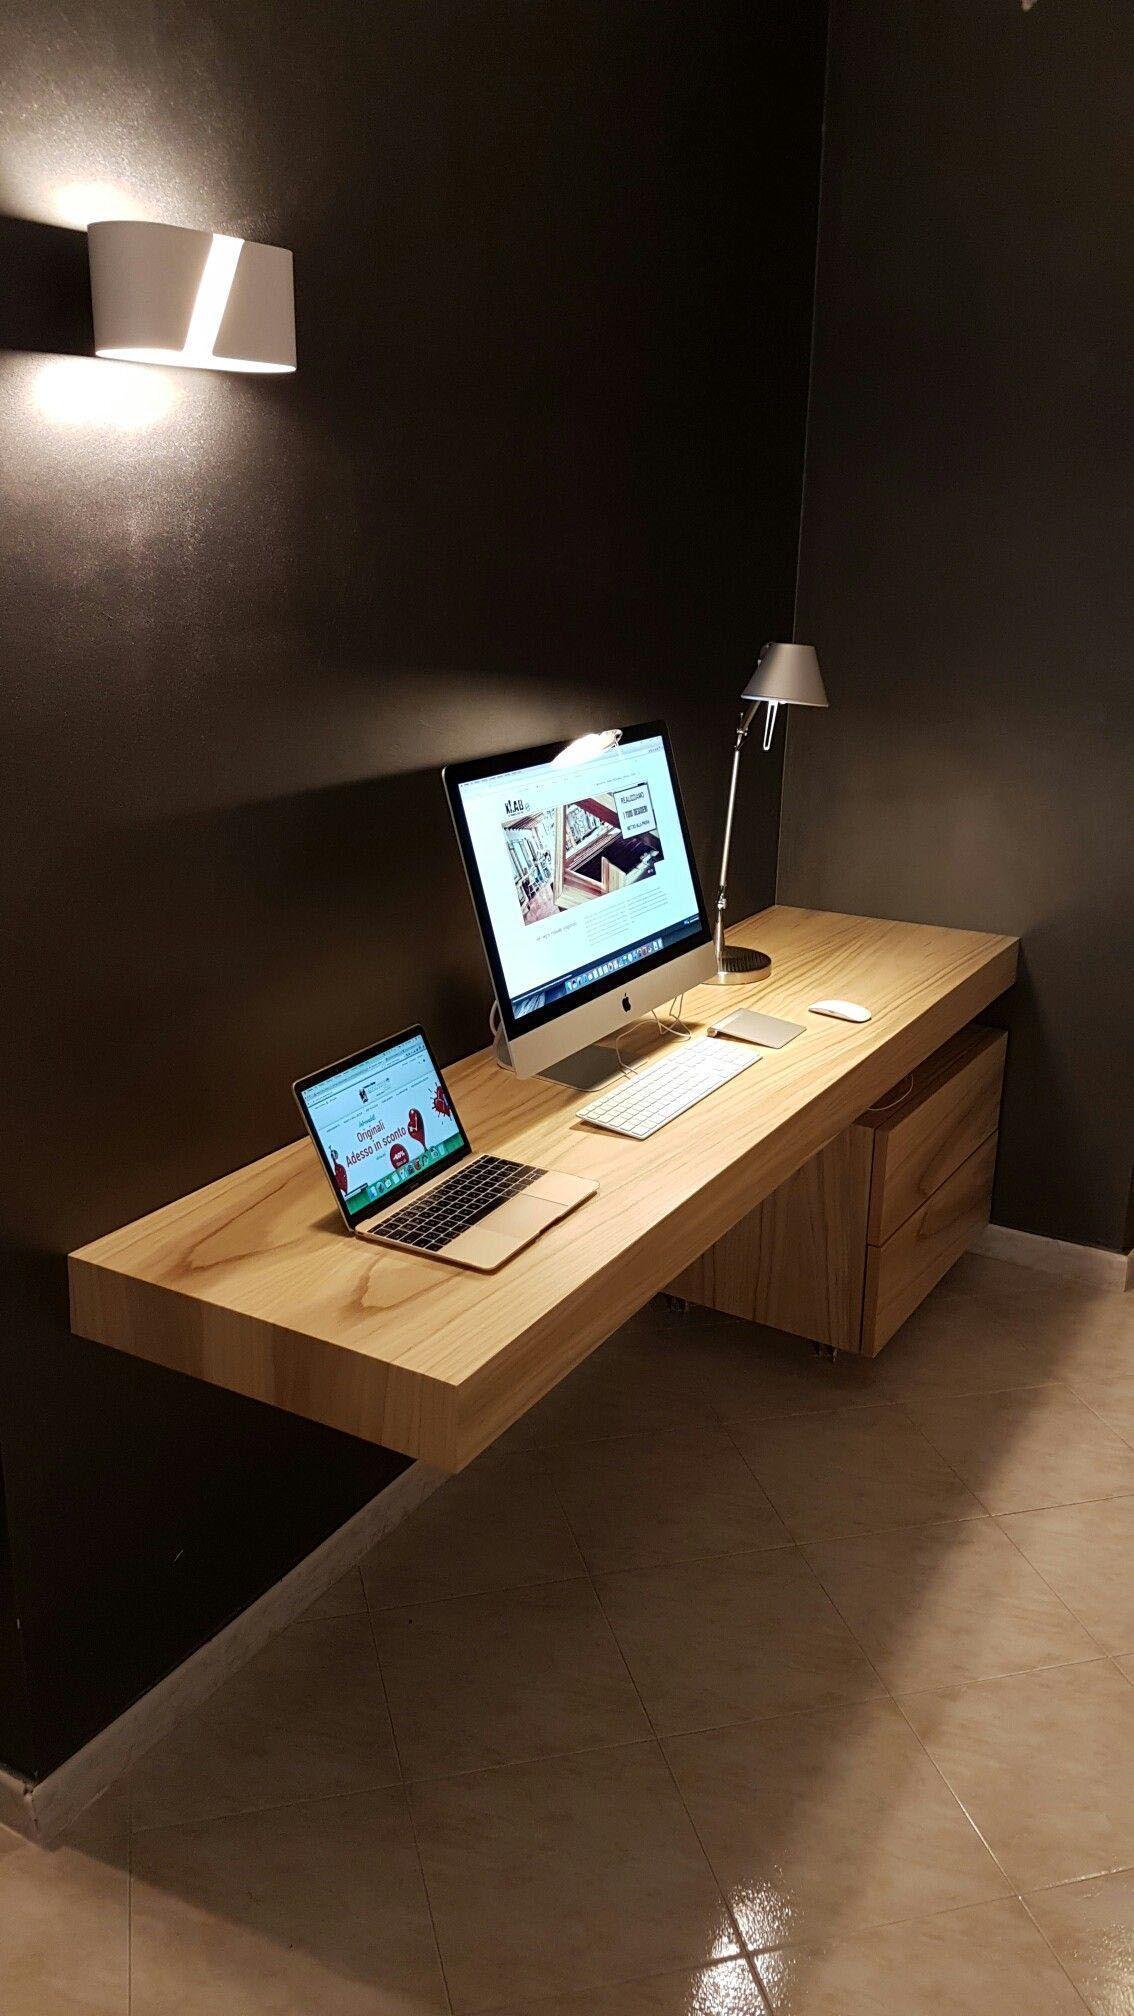 Superb Computer Desk Case Exclusive On Interioropedia Com Diy